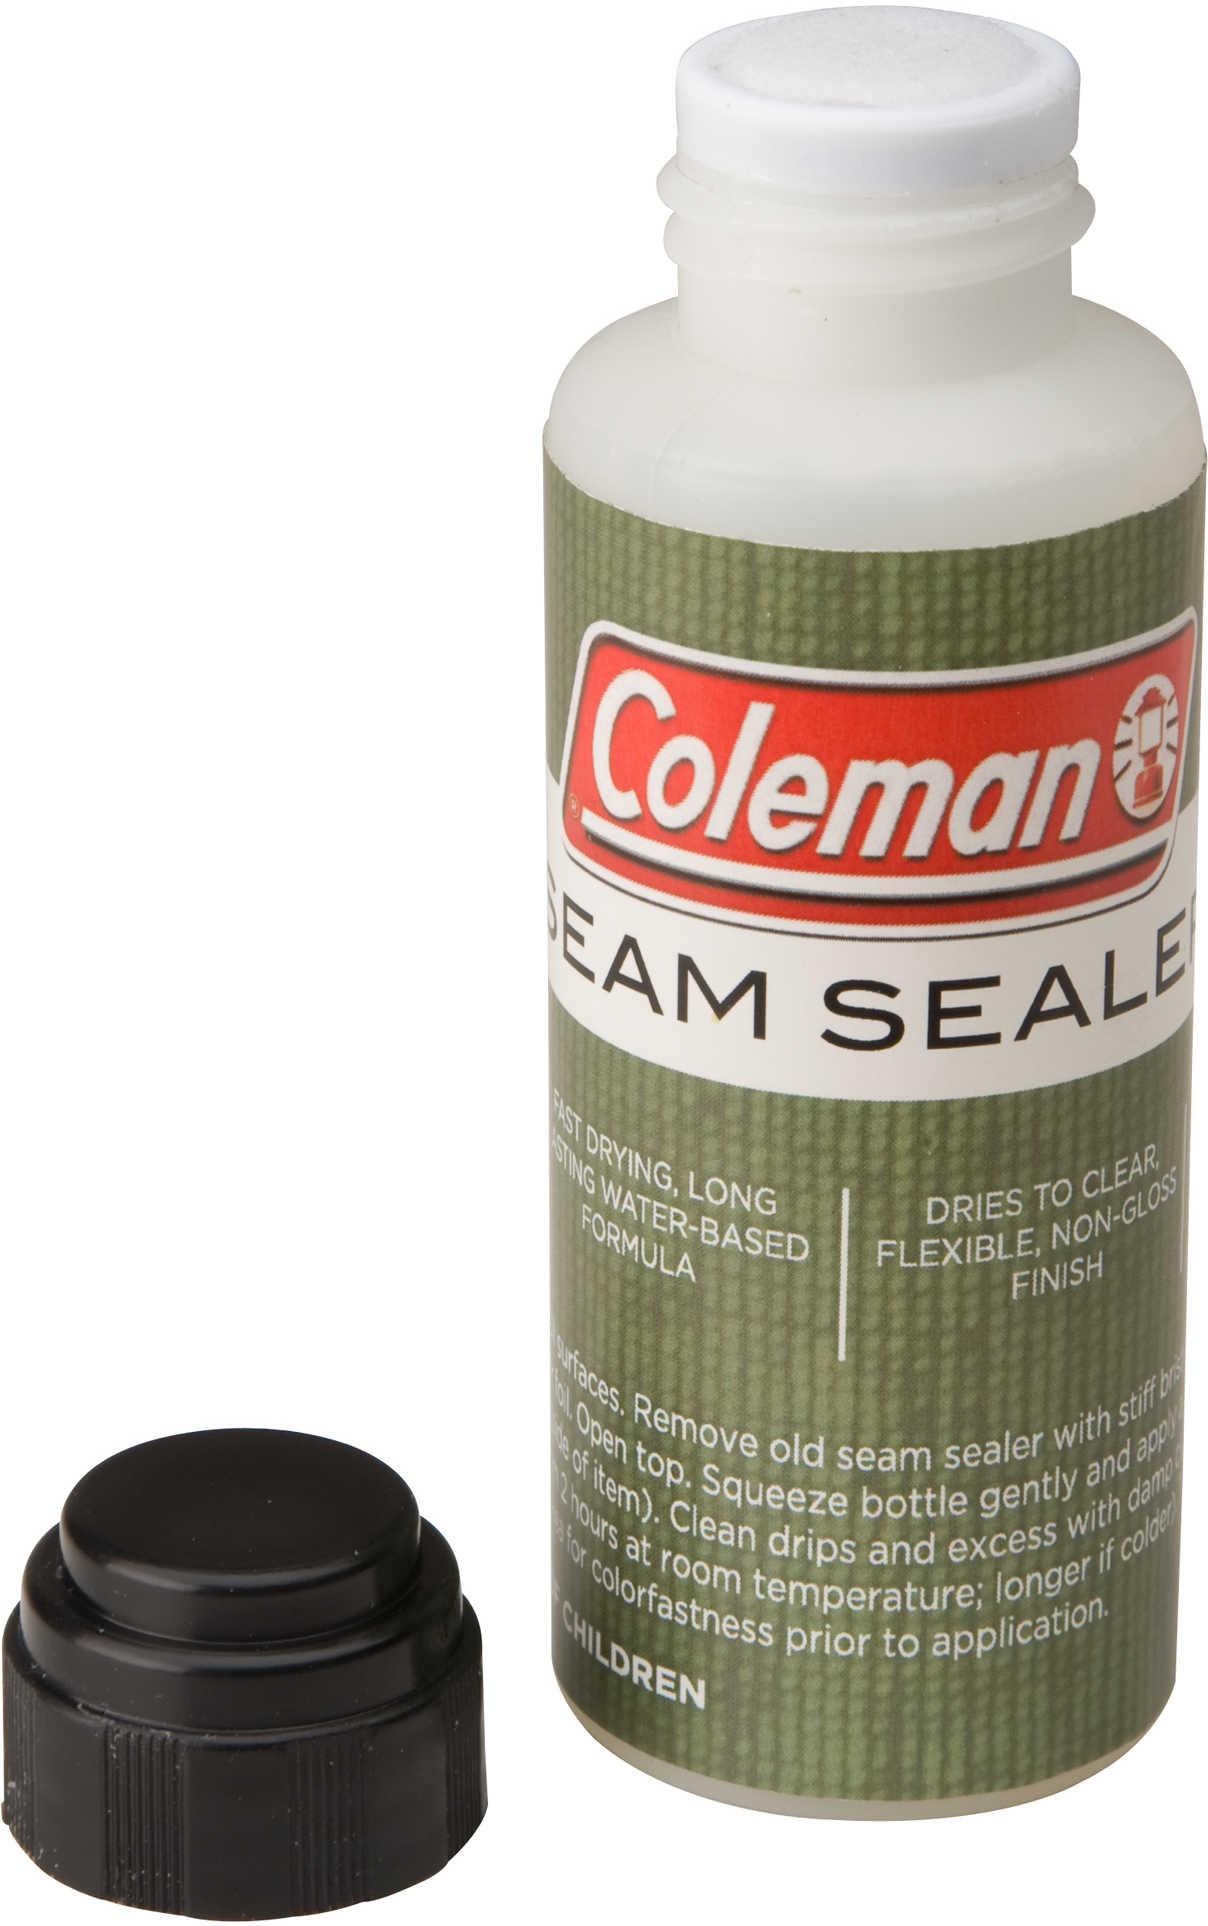 Coleman Seam Sealer No Brush Md: 2000016520